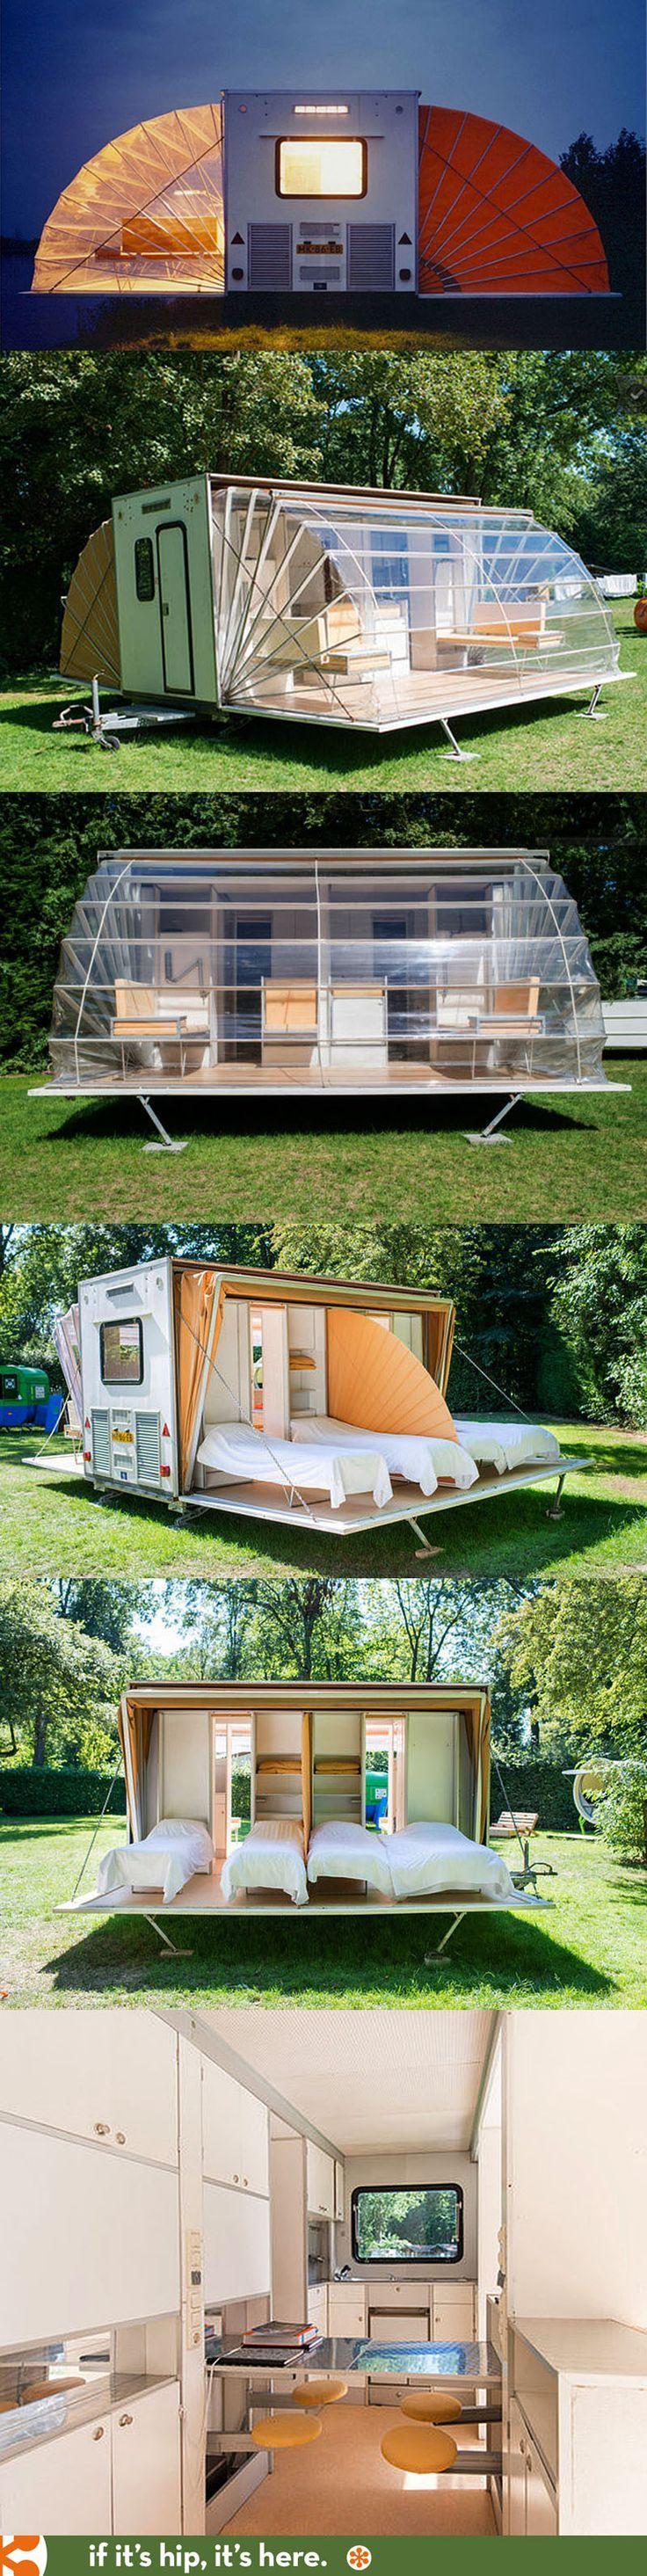 Caravana extensible